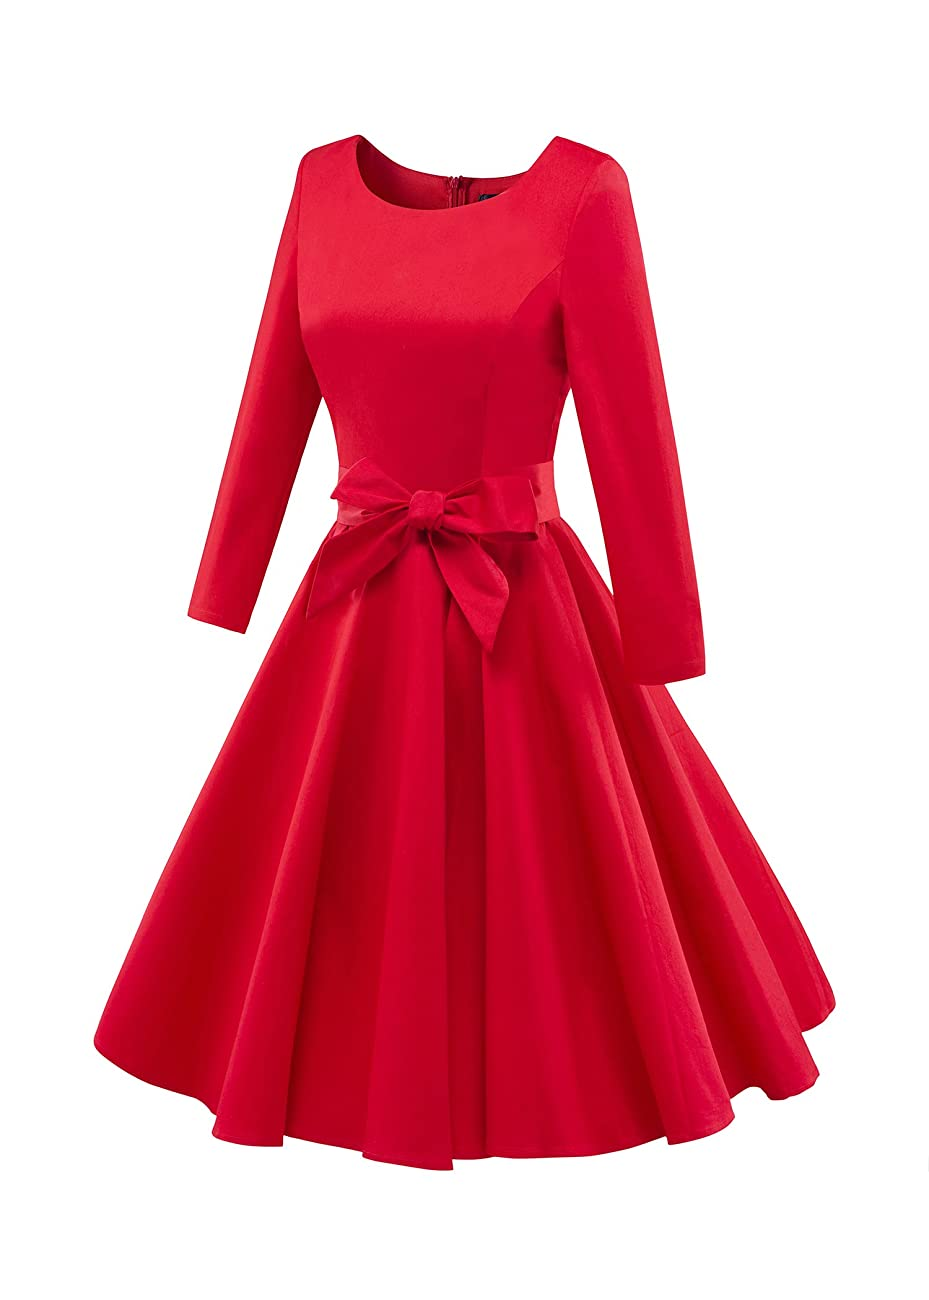 LUOUSE Audrey Hepburn 3/4 Sleeve 1950s Vintage Rockabilly Dress 1